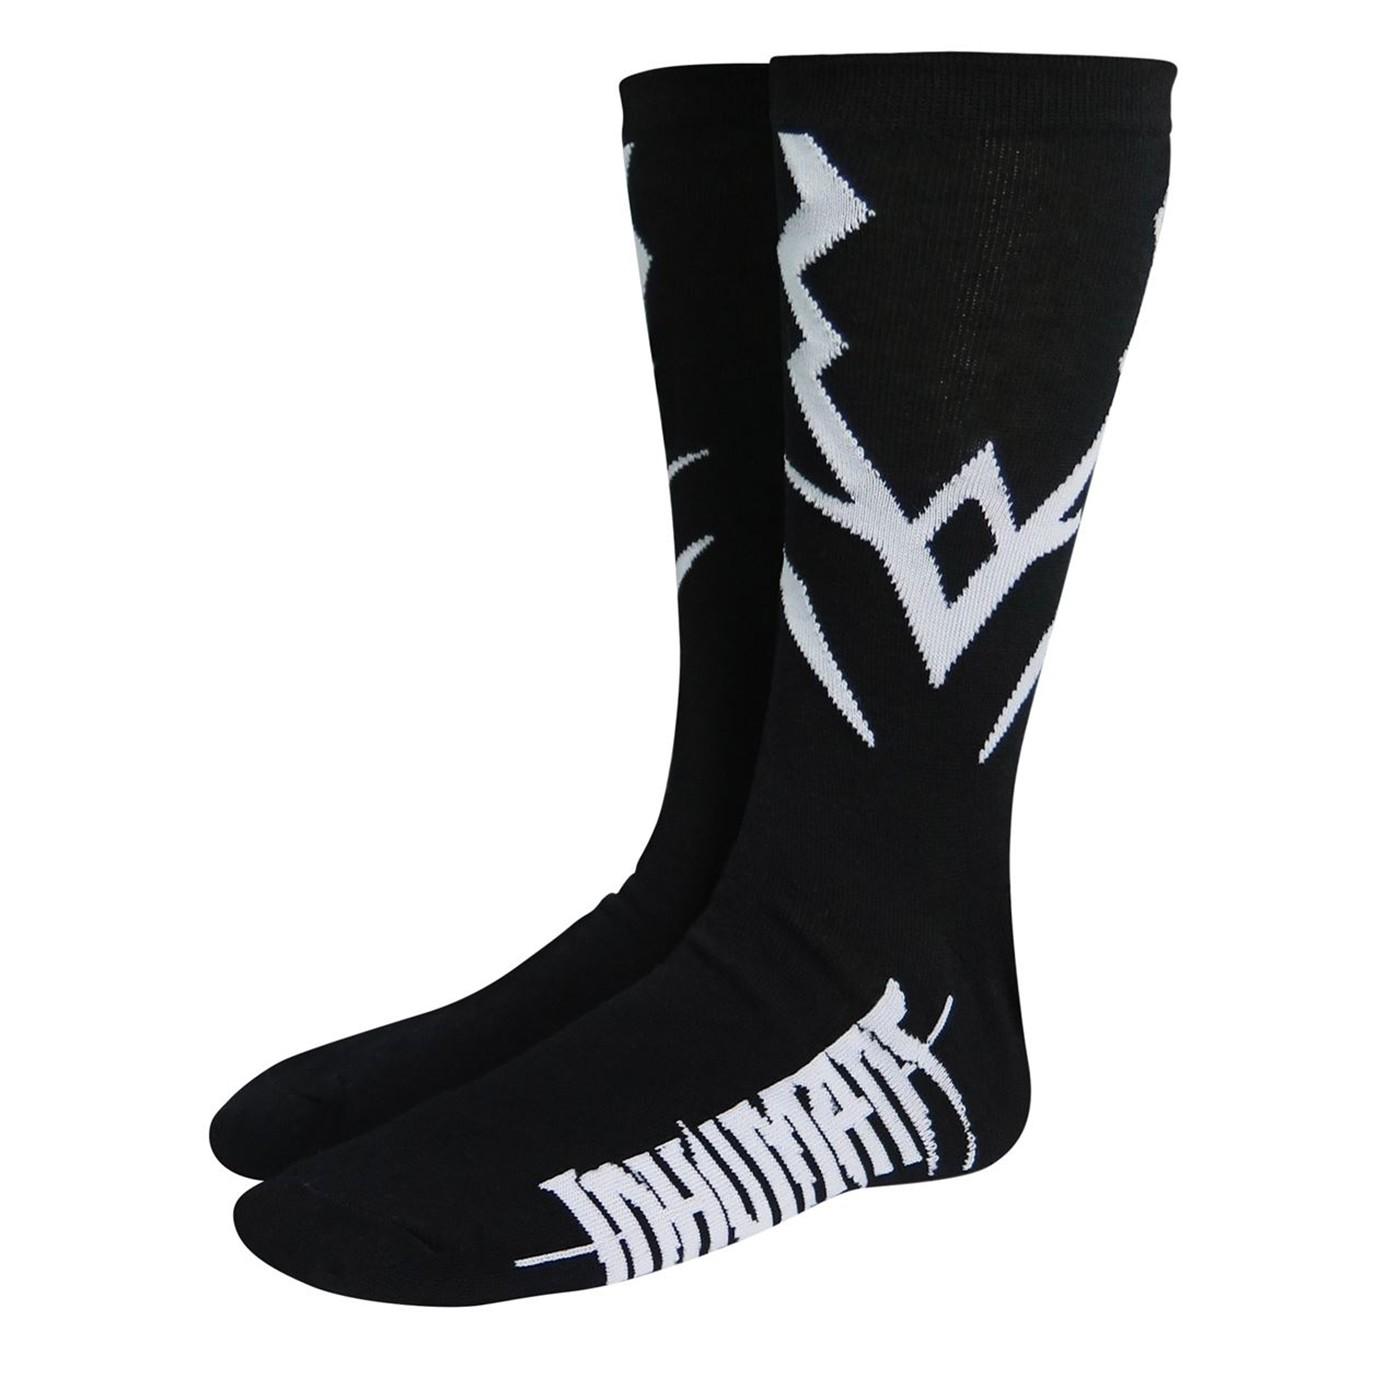 Inhumans Black Bolt Costume Crew Socks